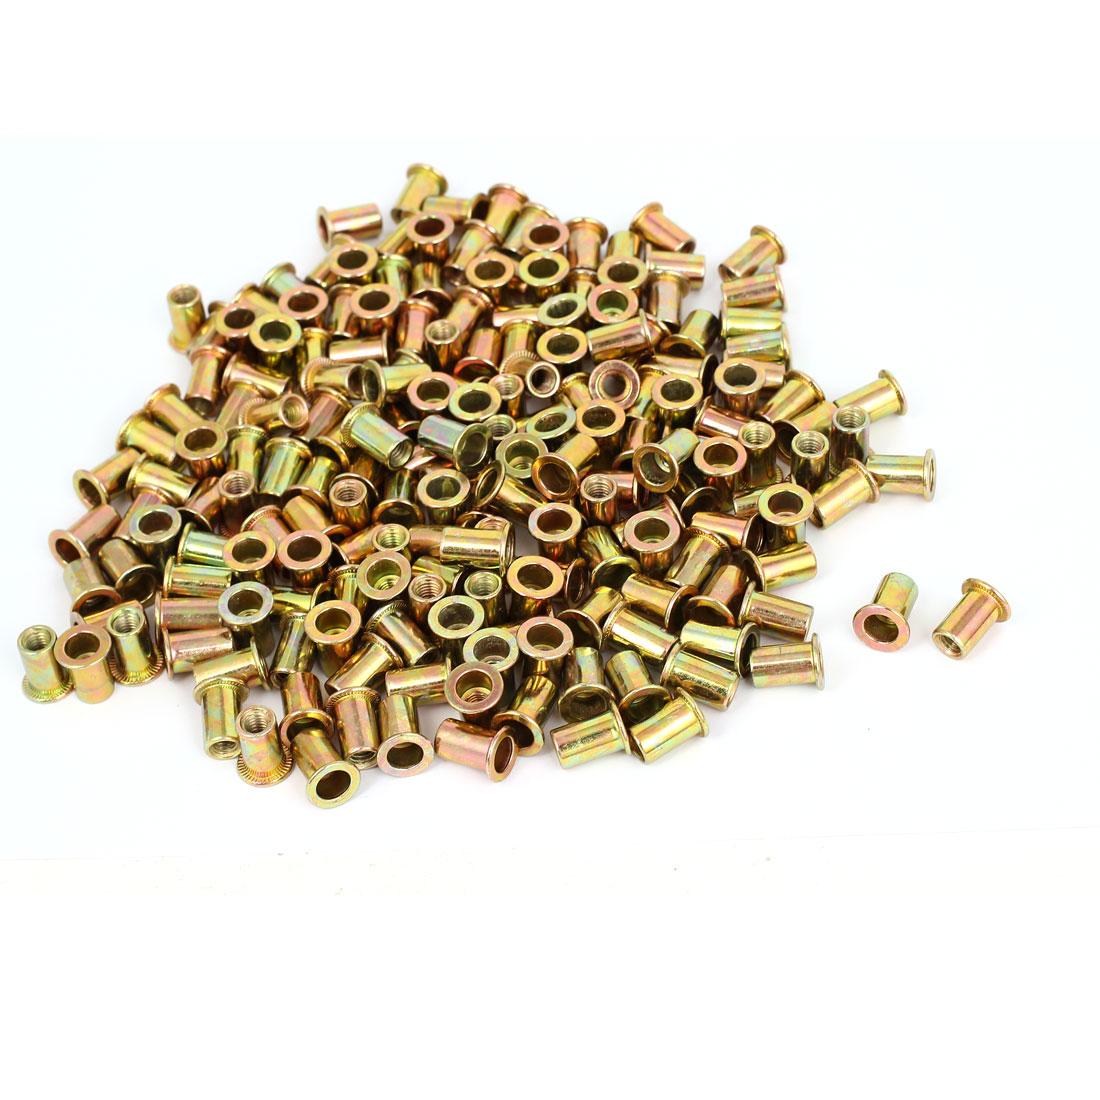 300 Pcs M6x15mm Round Body Countersunk Head Rivet Nut Insert Nutserts